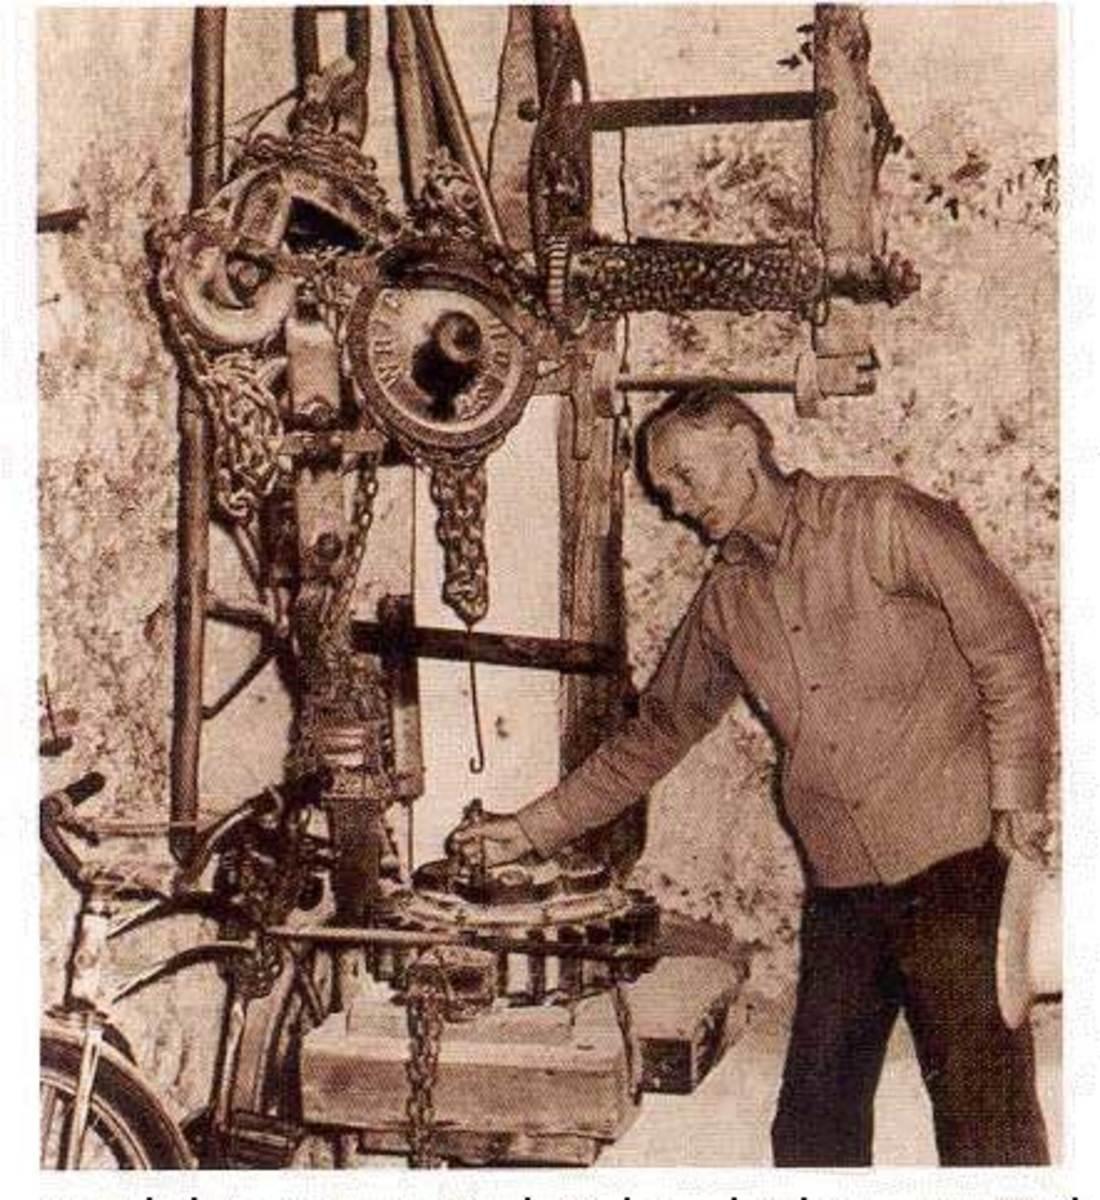 Ed Leedskalnin's Magnetic Flywheel Aparatus